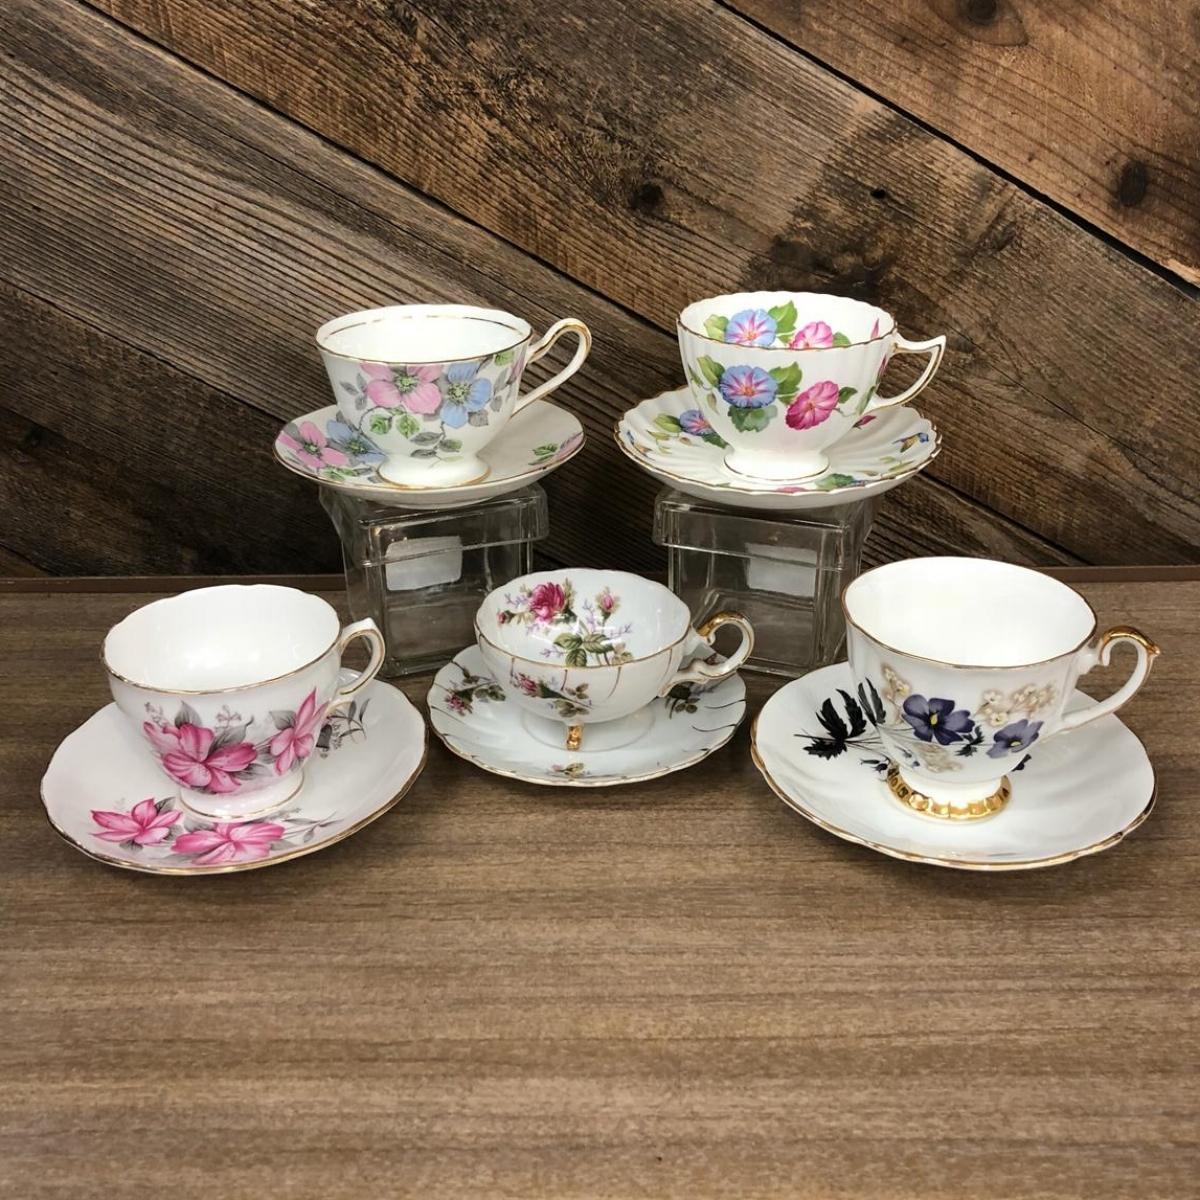 English China Teacups